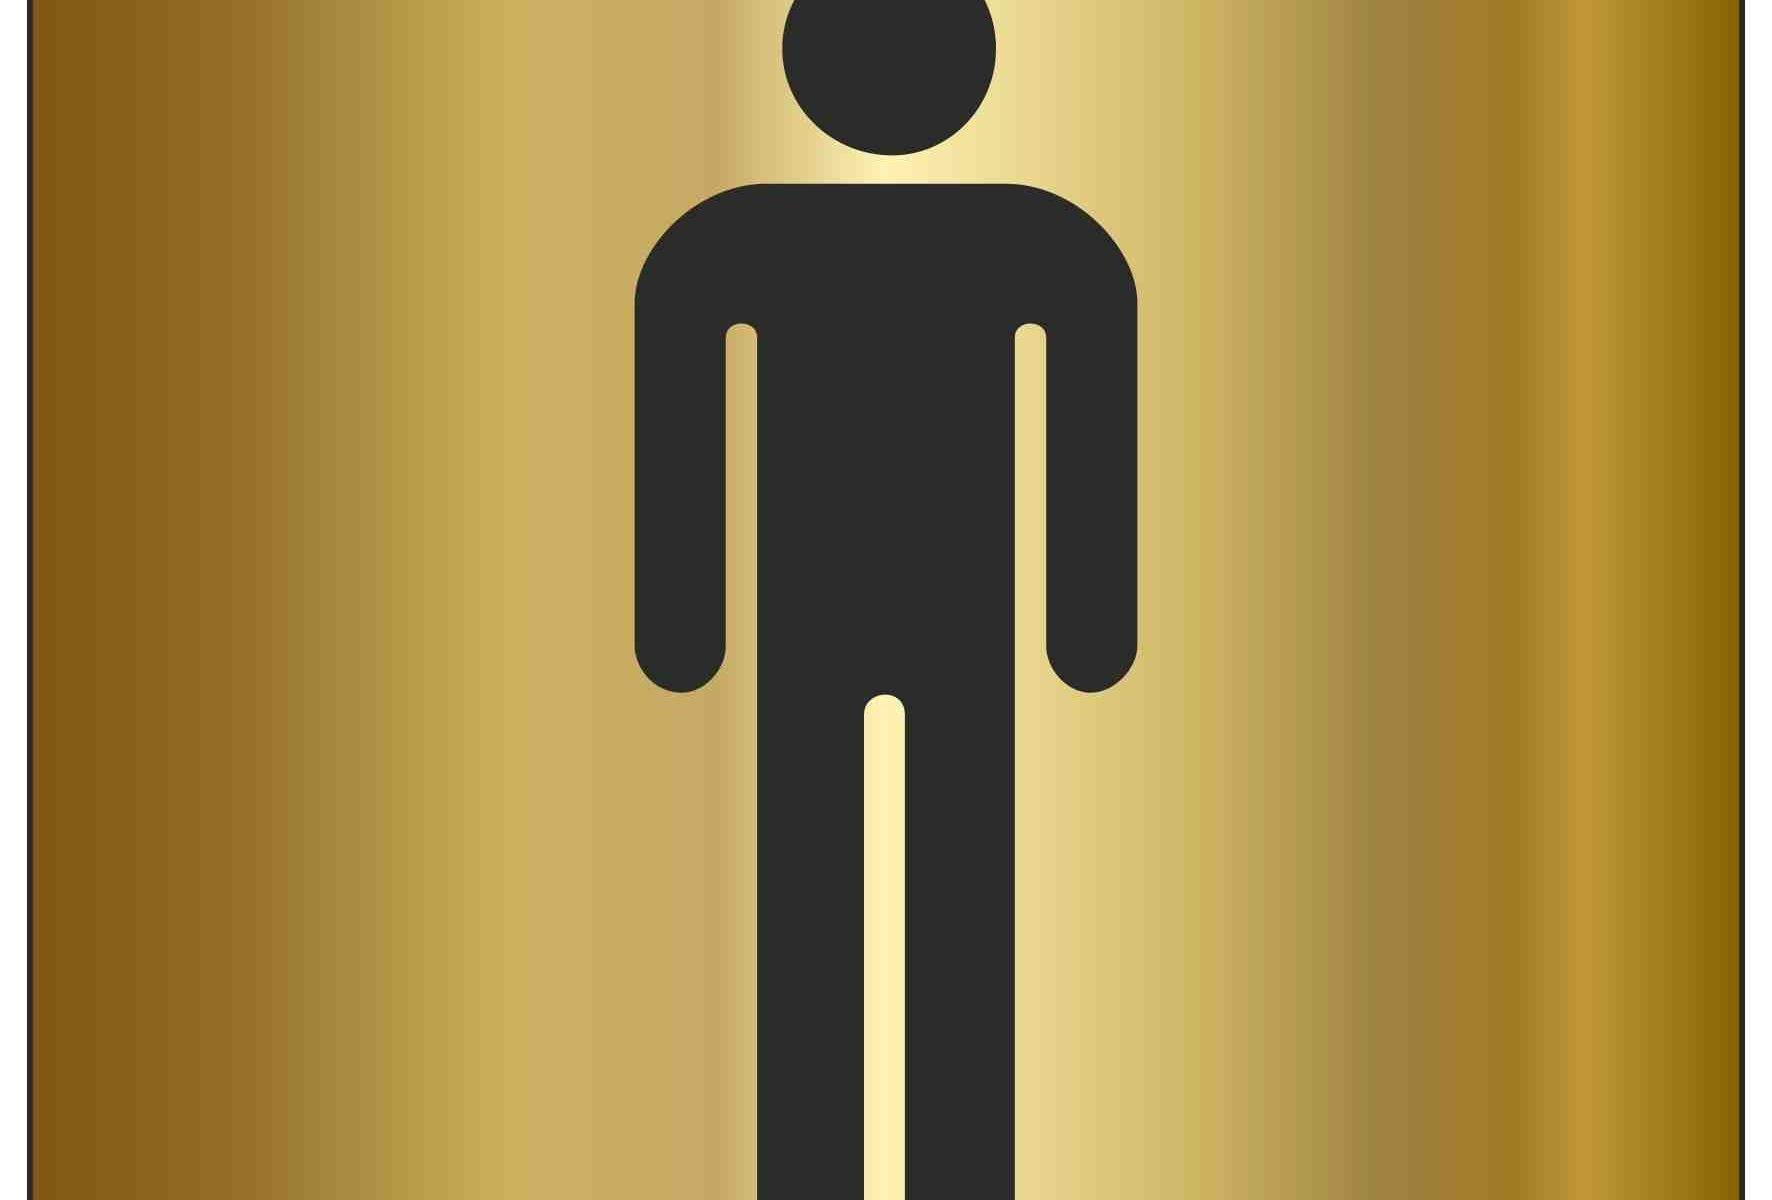 Male Toilet Symbol